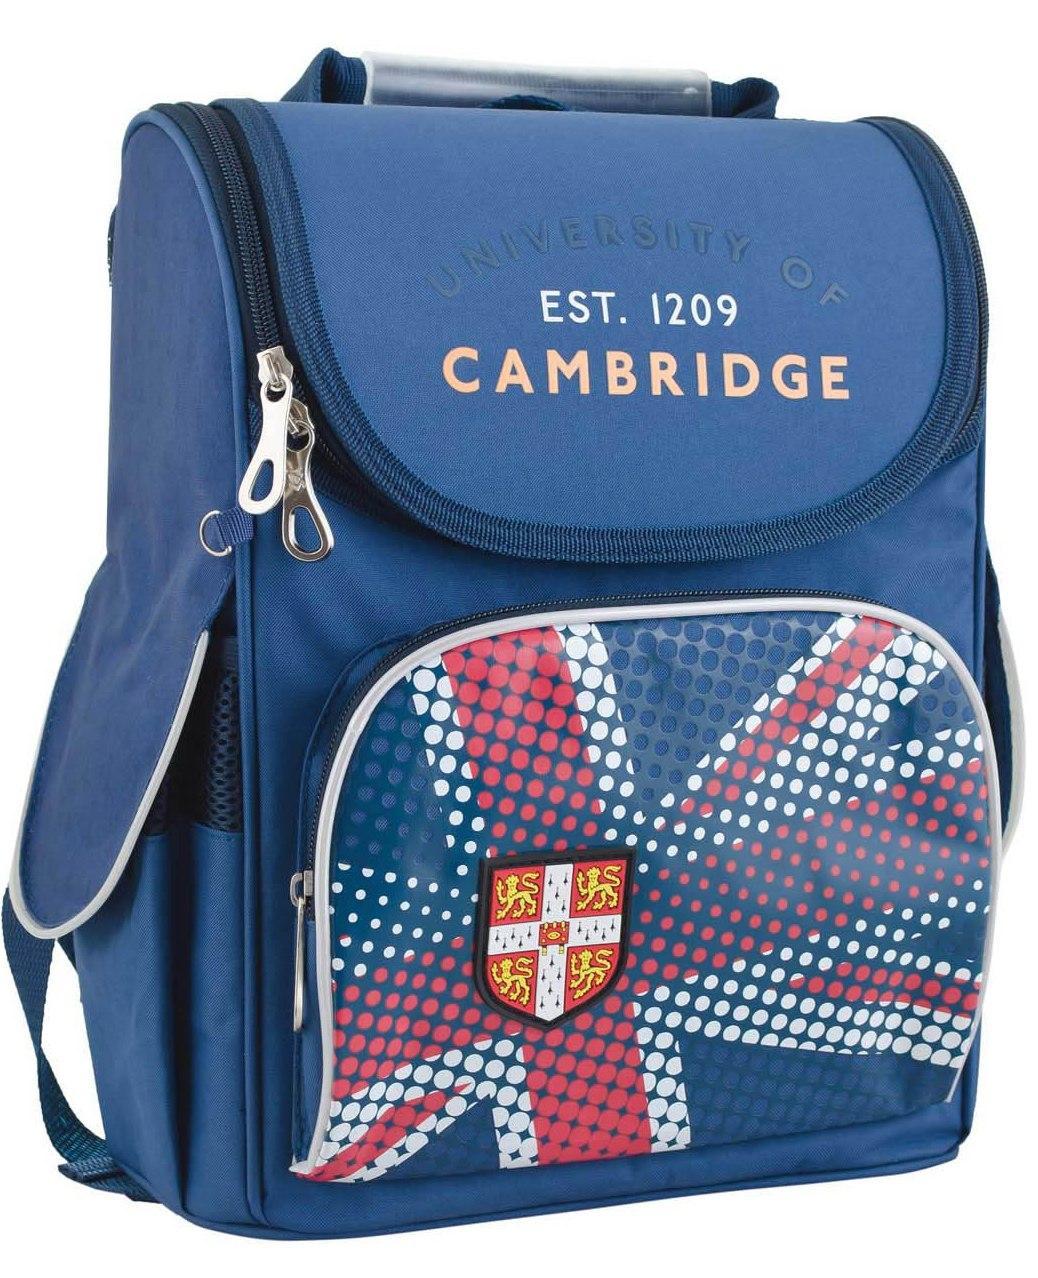 Рюкзак Yes Cambridge blue, 553304 синий 12 л